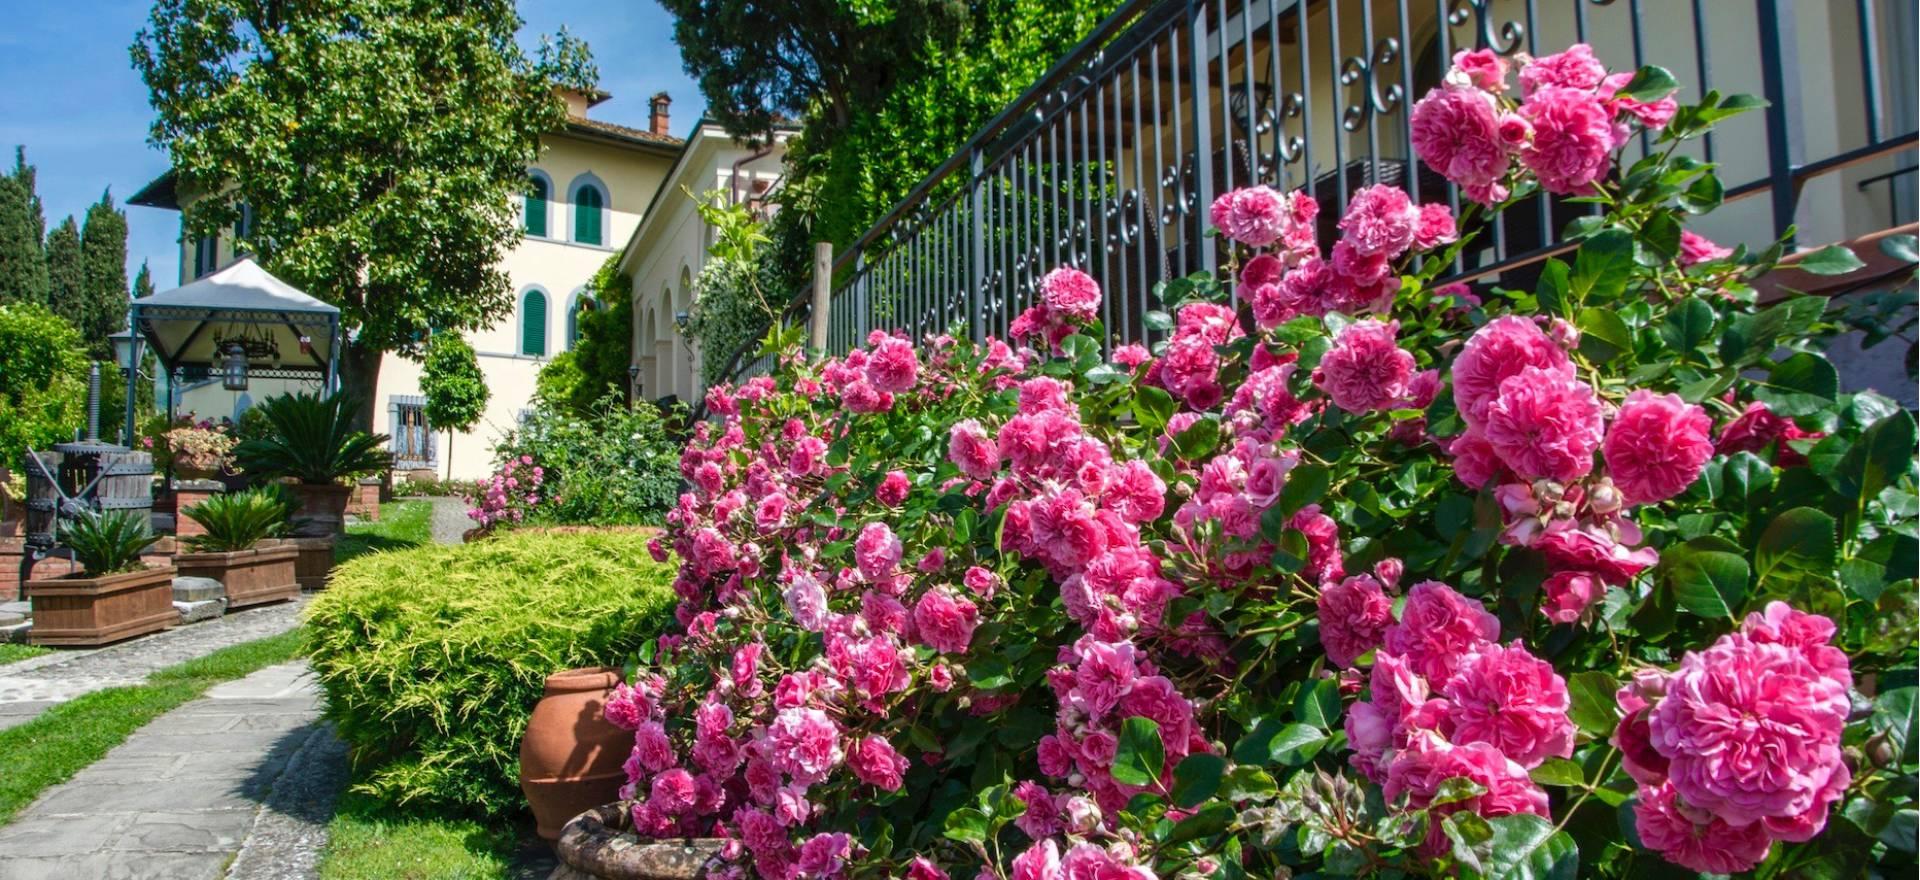 Agriturismo Toscane Romantische agriturismo in statige villa in Toscane